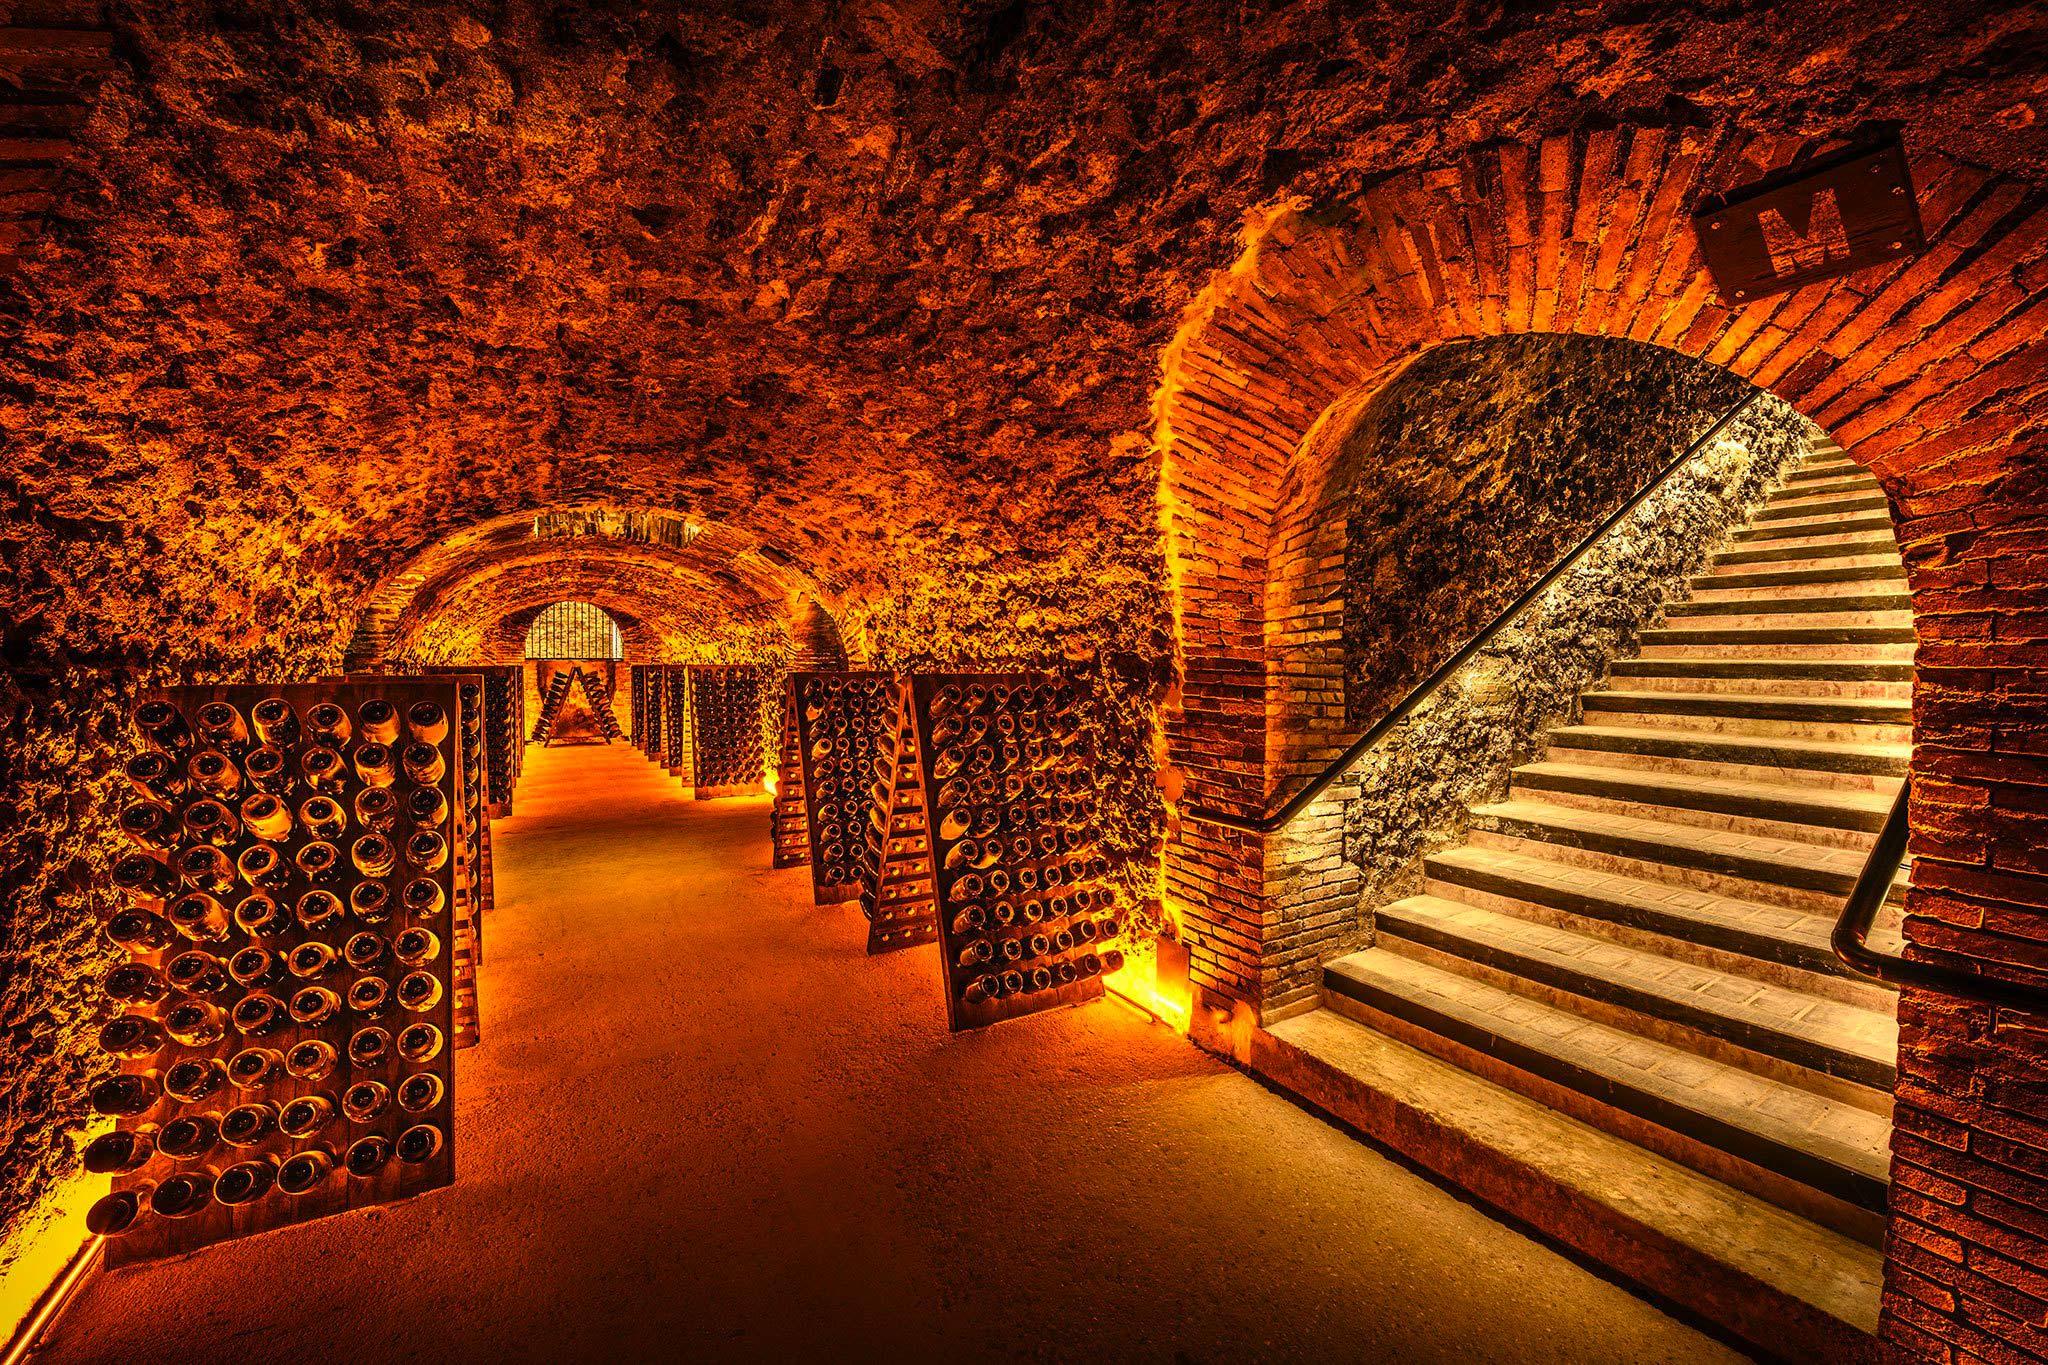 Réservations - Champagne Boizel - Epernay France